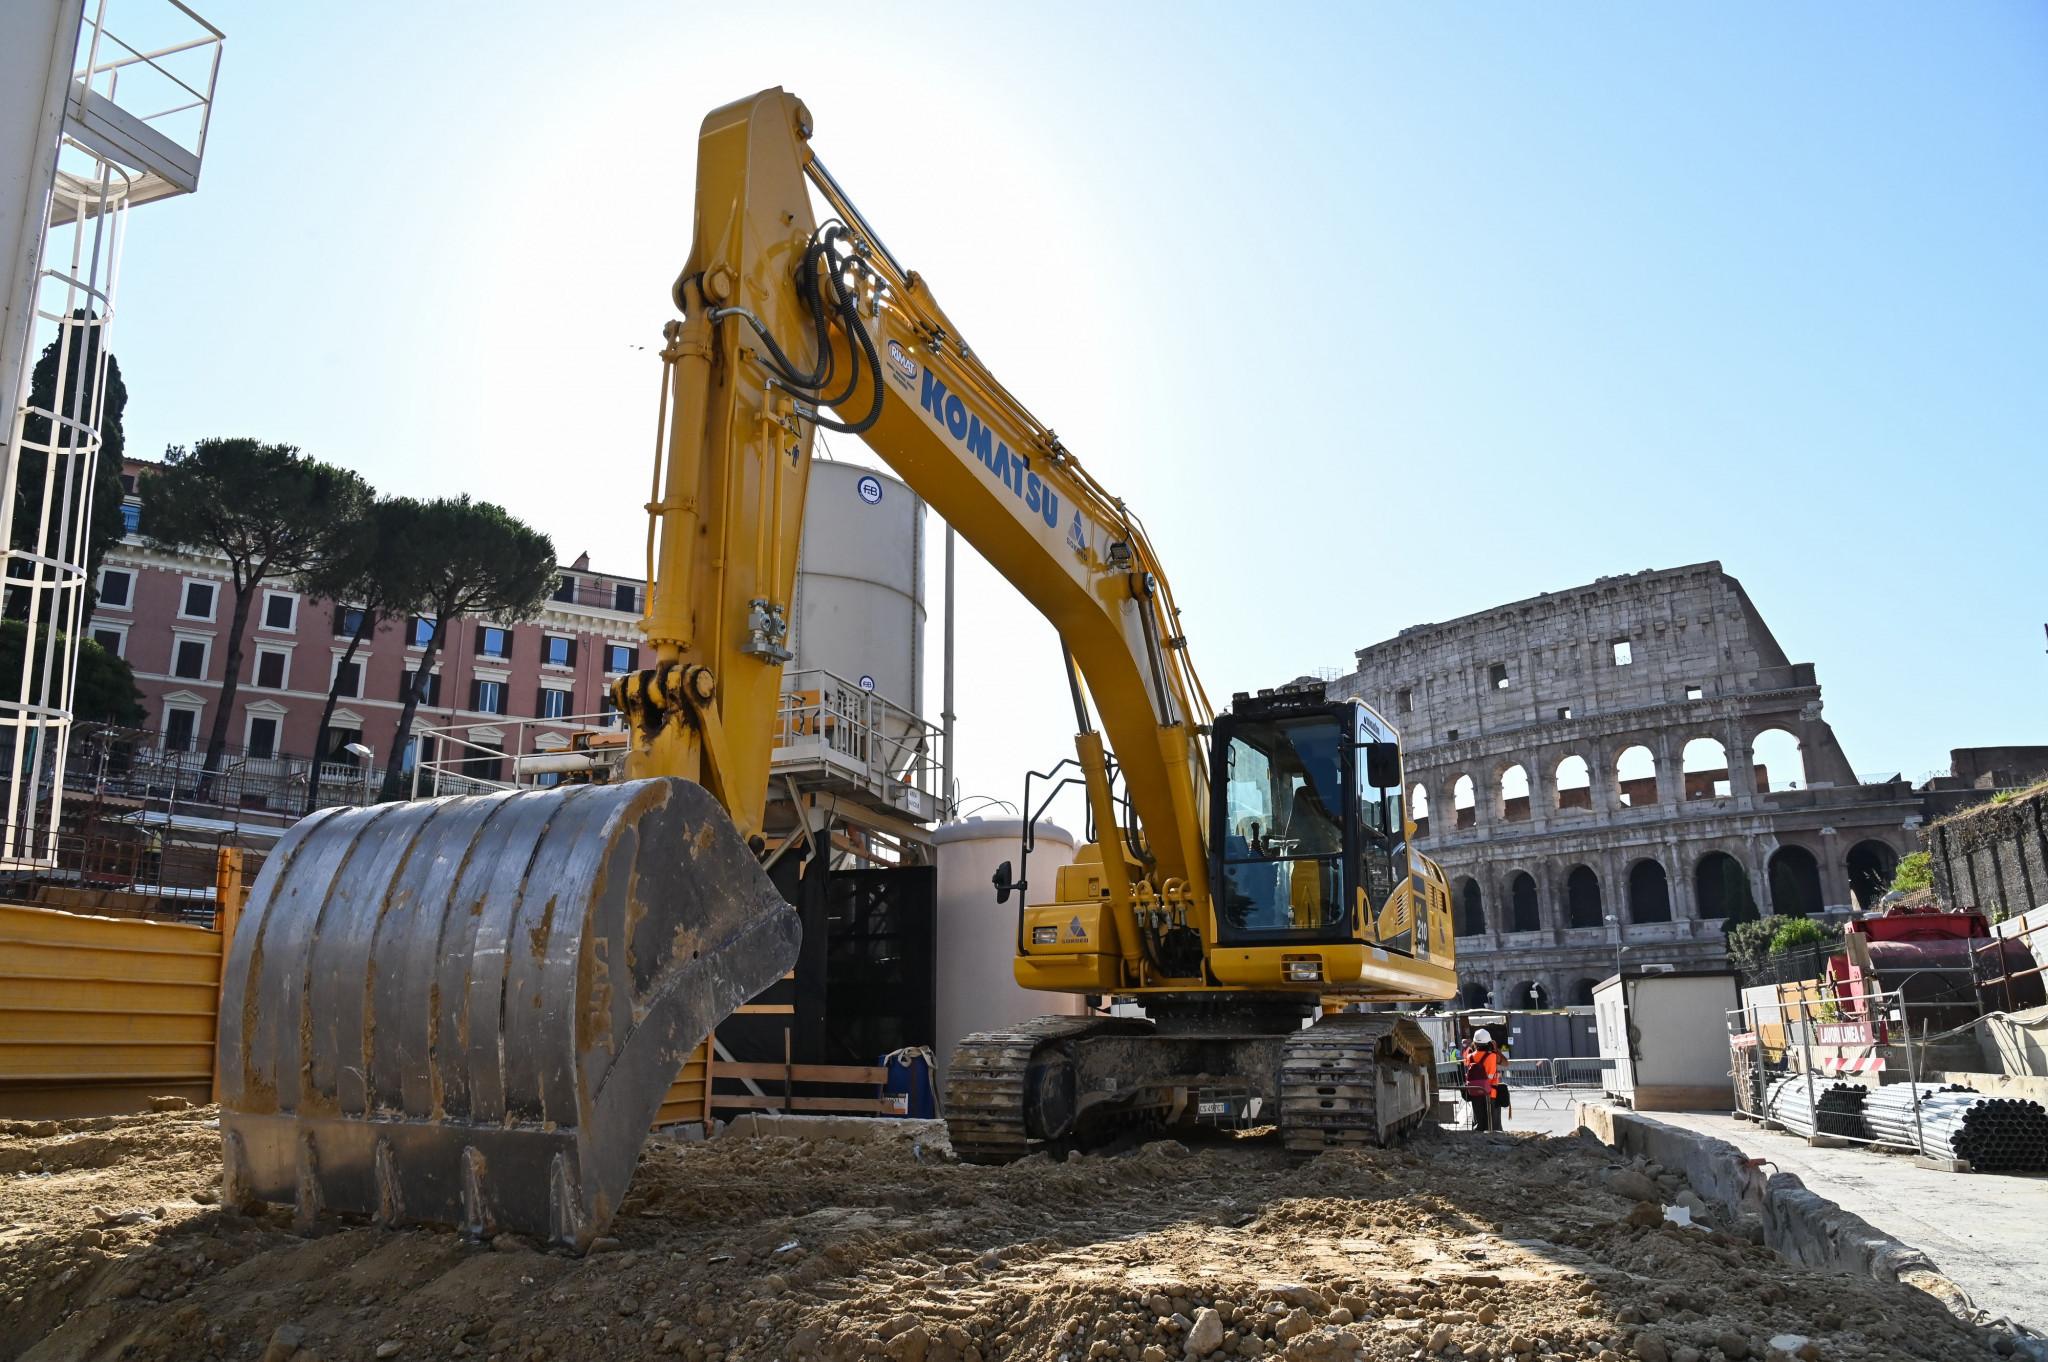 Environmental groups demand Milan Cortina 2026 projects go through Strategic Environmental Assessments